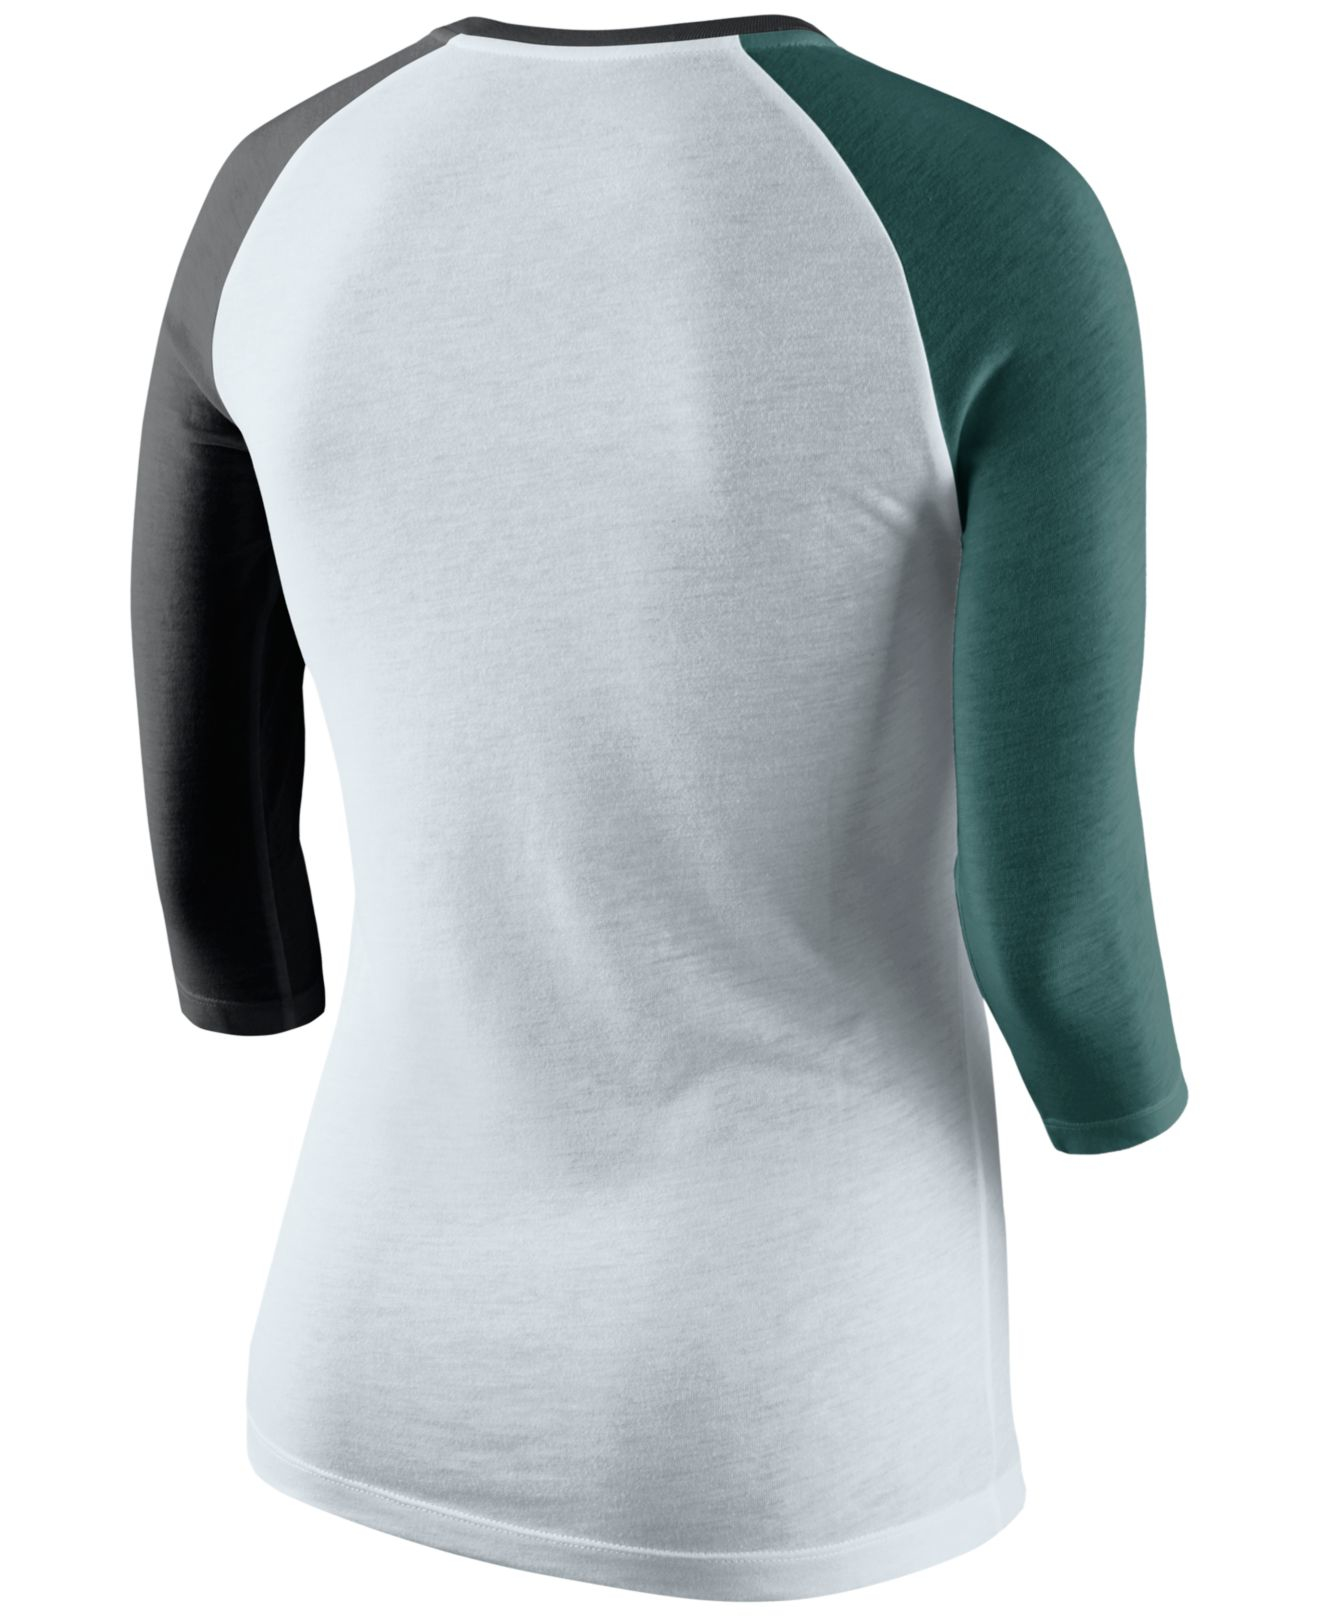 uk availability c1b0d bc693 Nike Women's Philadelphia Eagles Strong Side T-shirt in ...